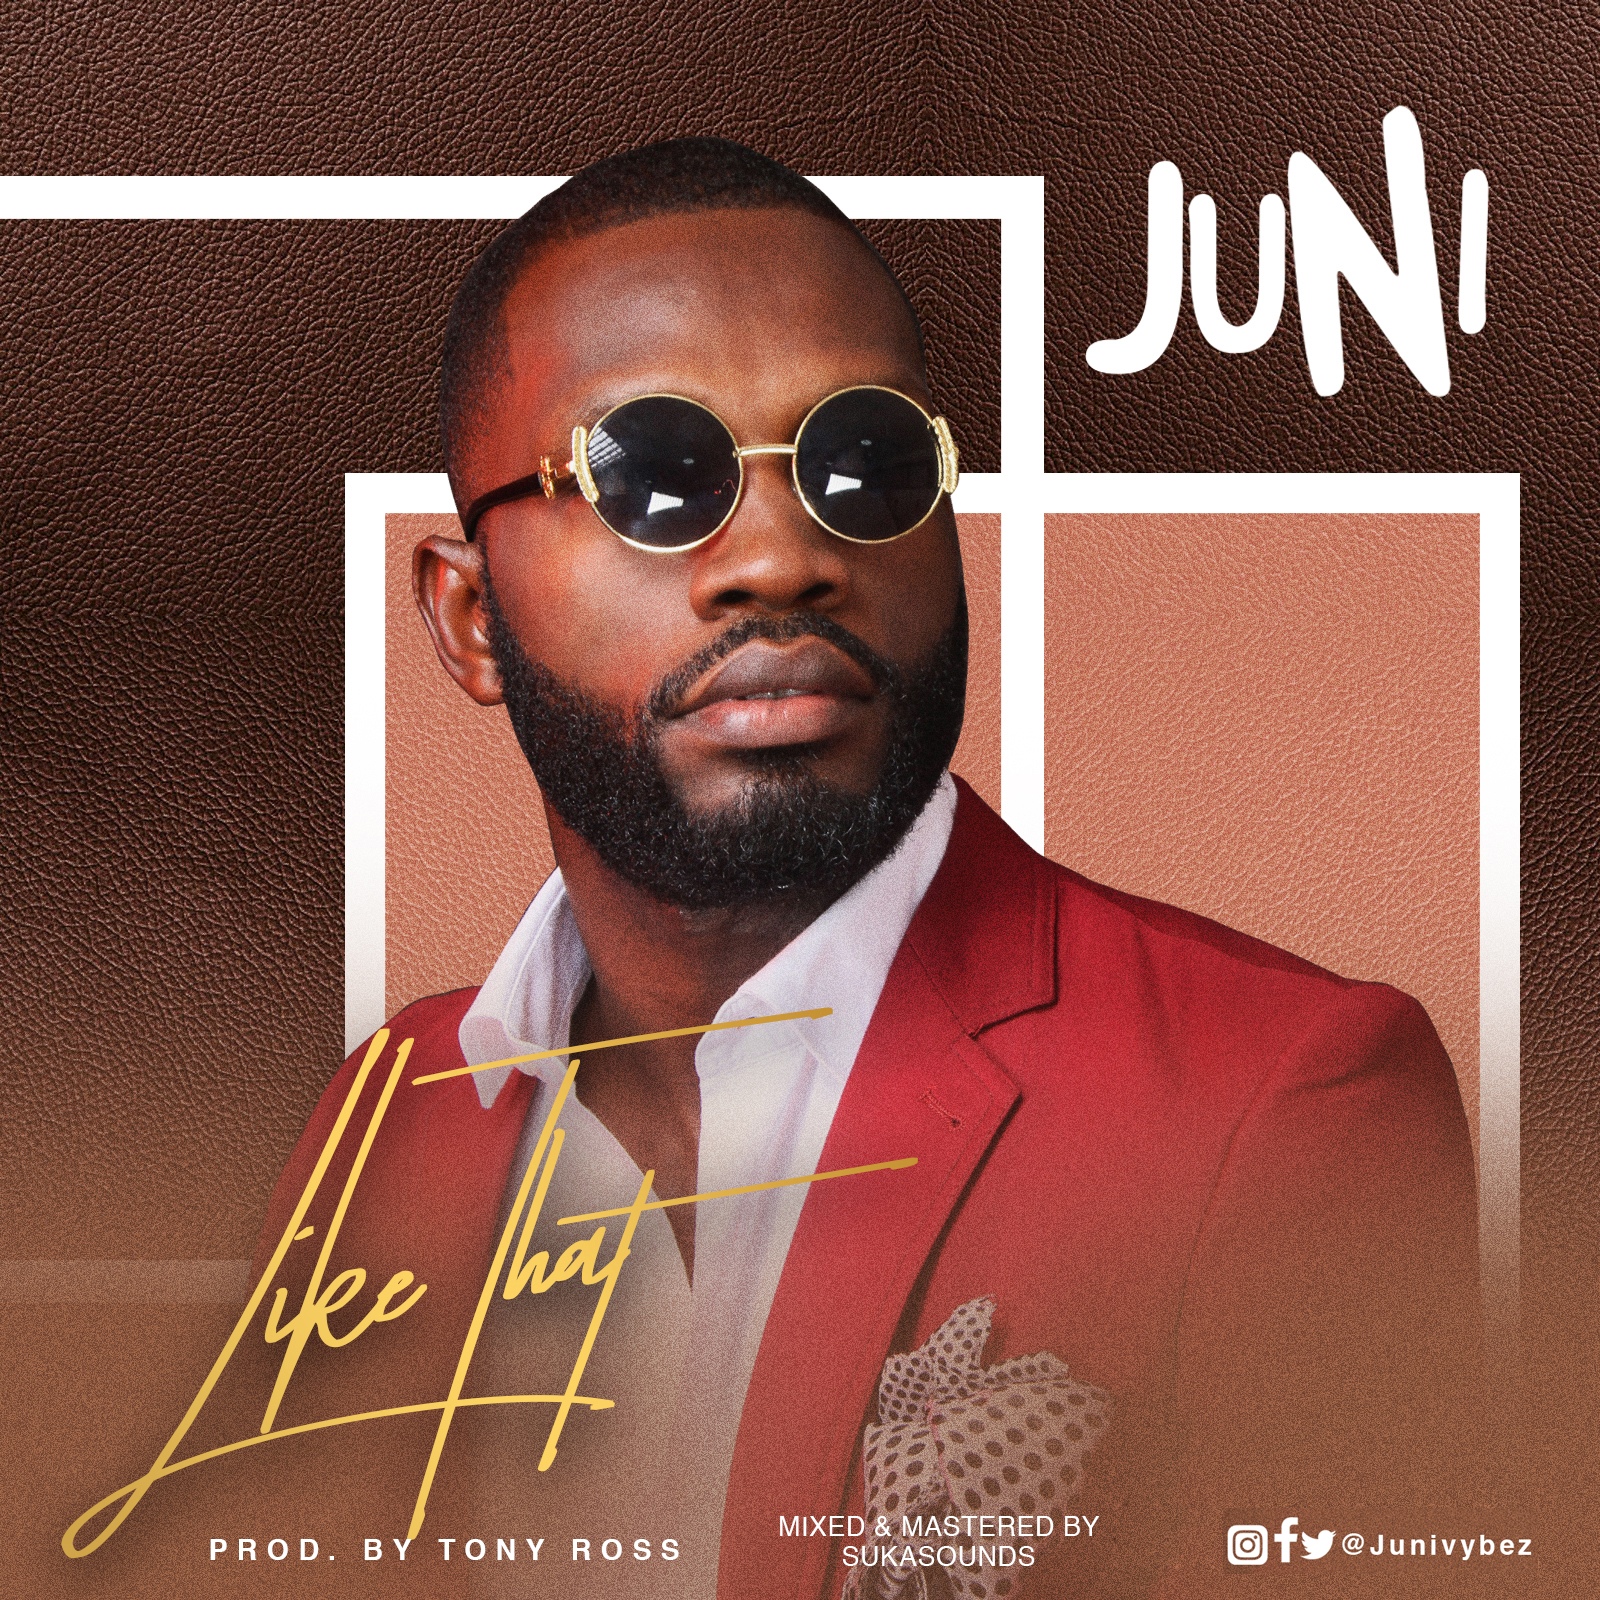 Juni – Like That